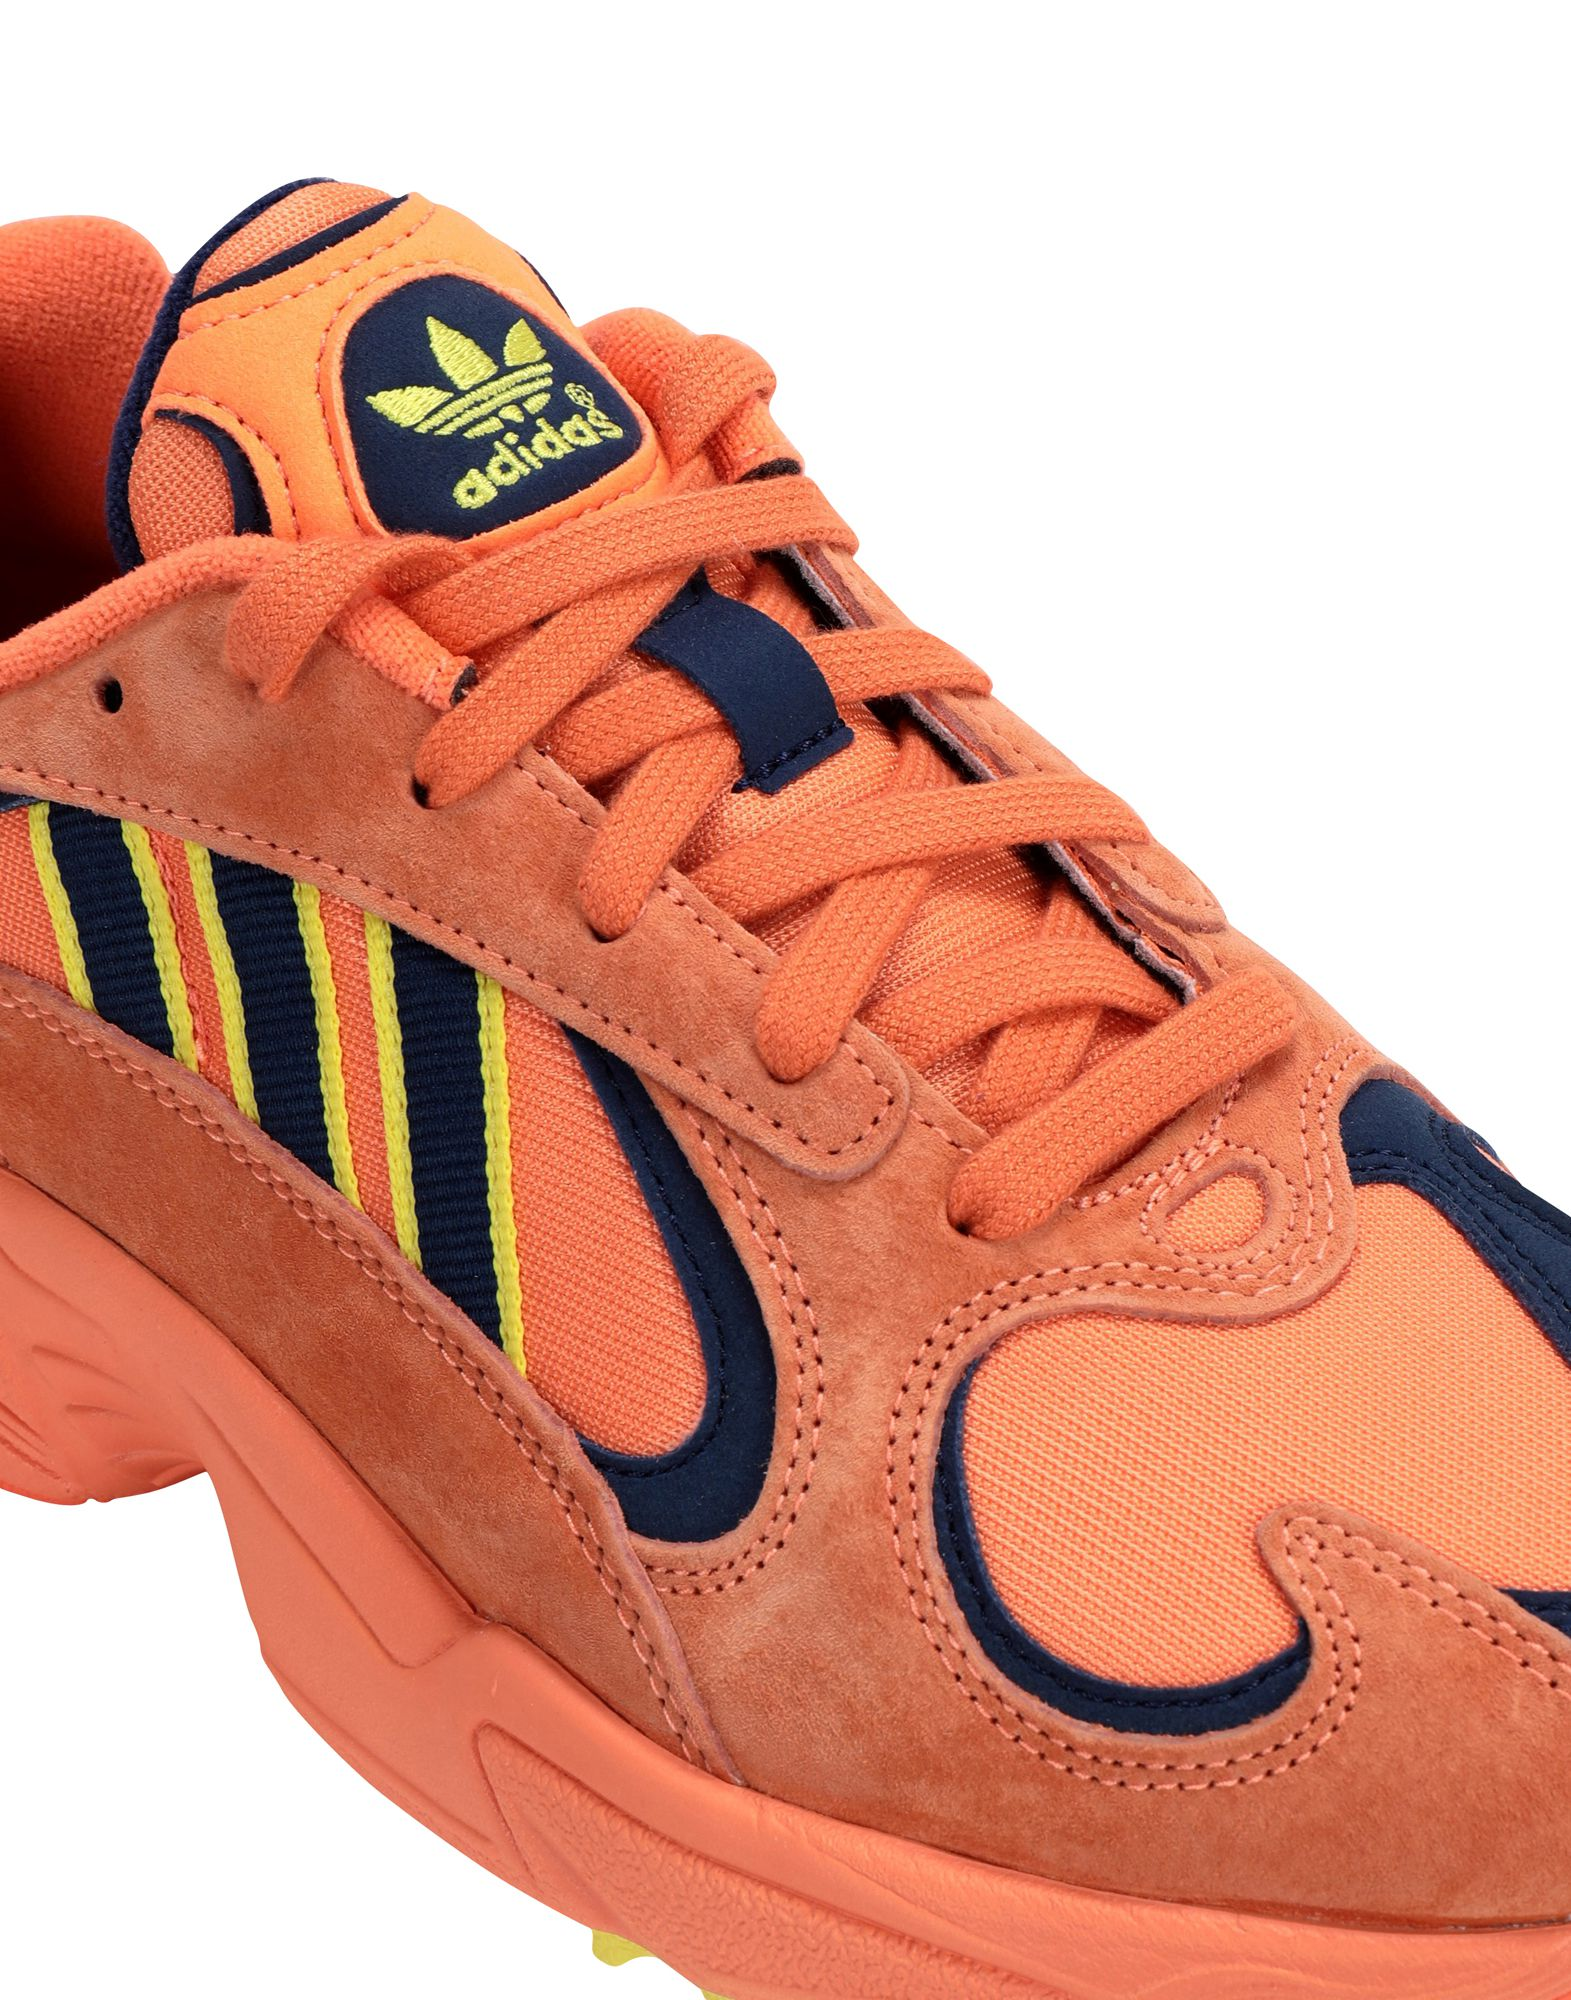 adidas originaux yung-1 - tennis - femmes adidas originaux originaux adidas des baskets en ligne le royaume - uni - 11579966ng 3d281e